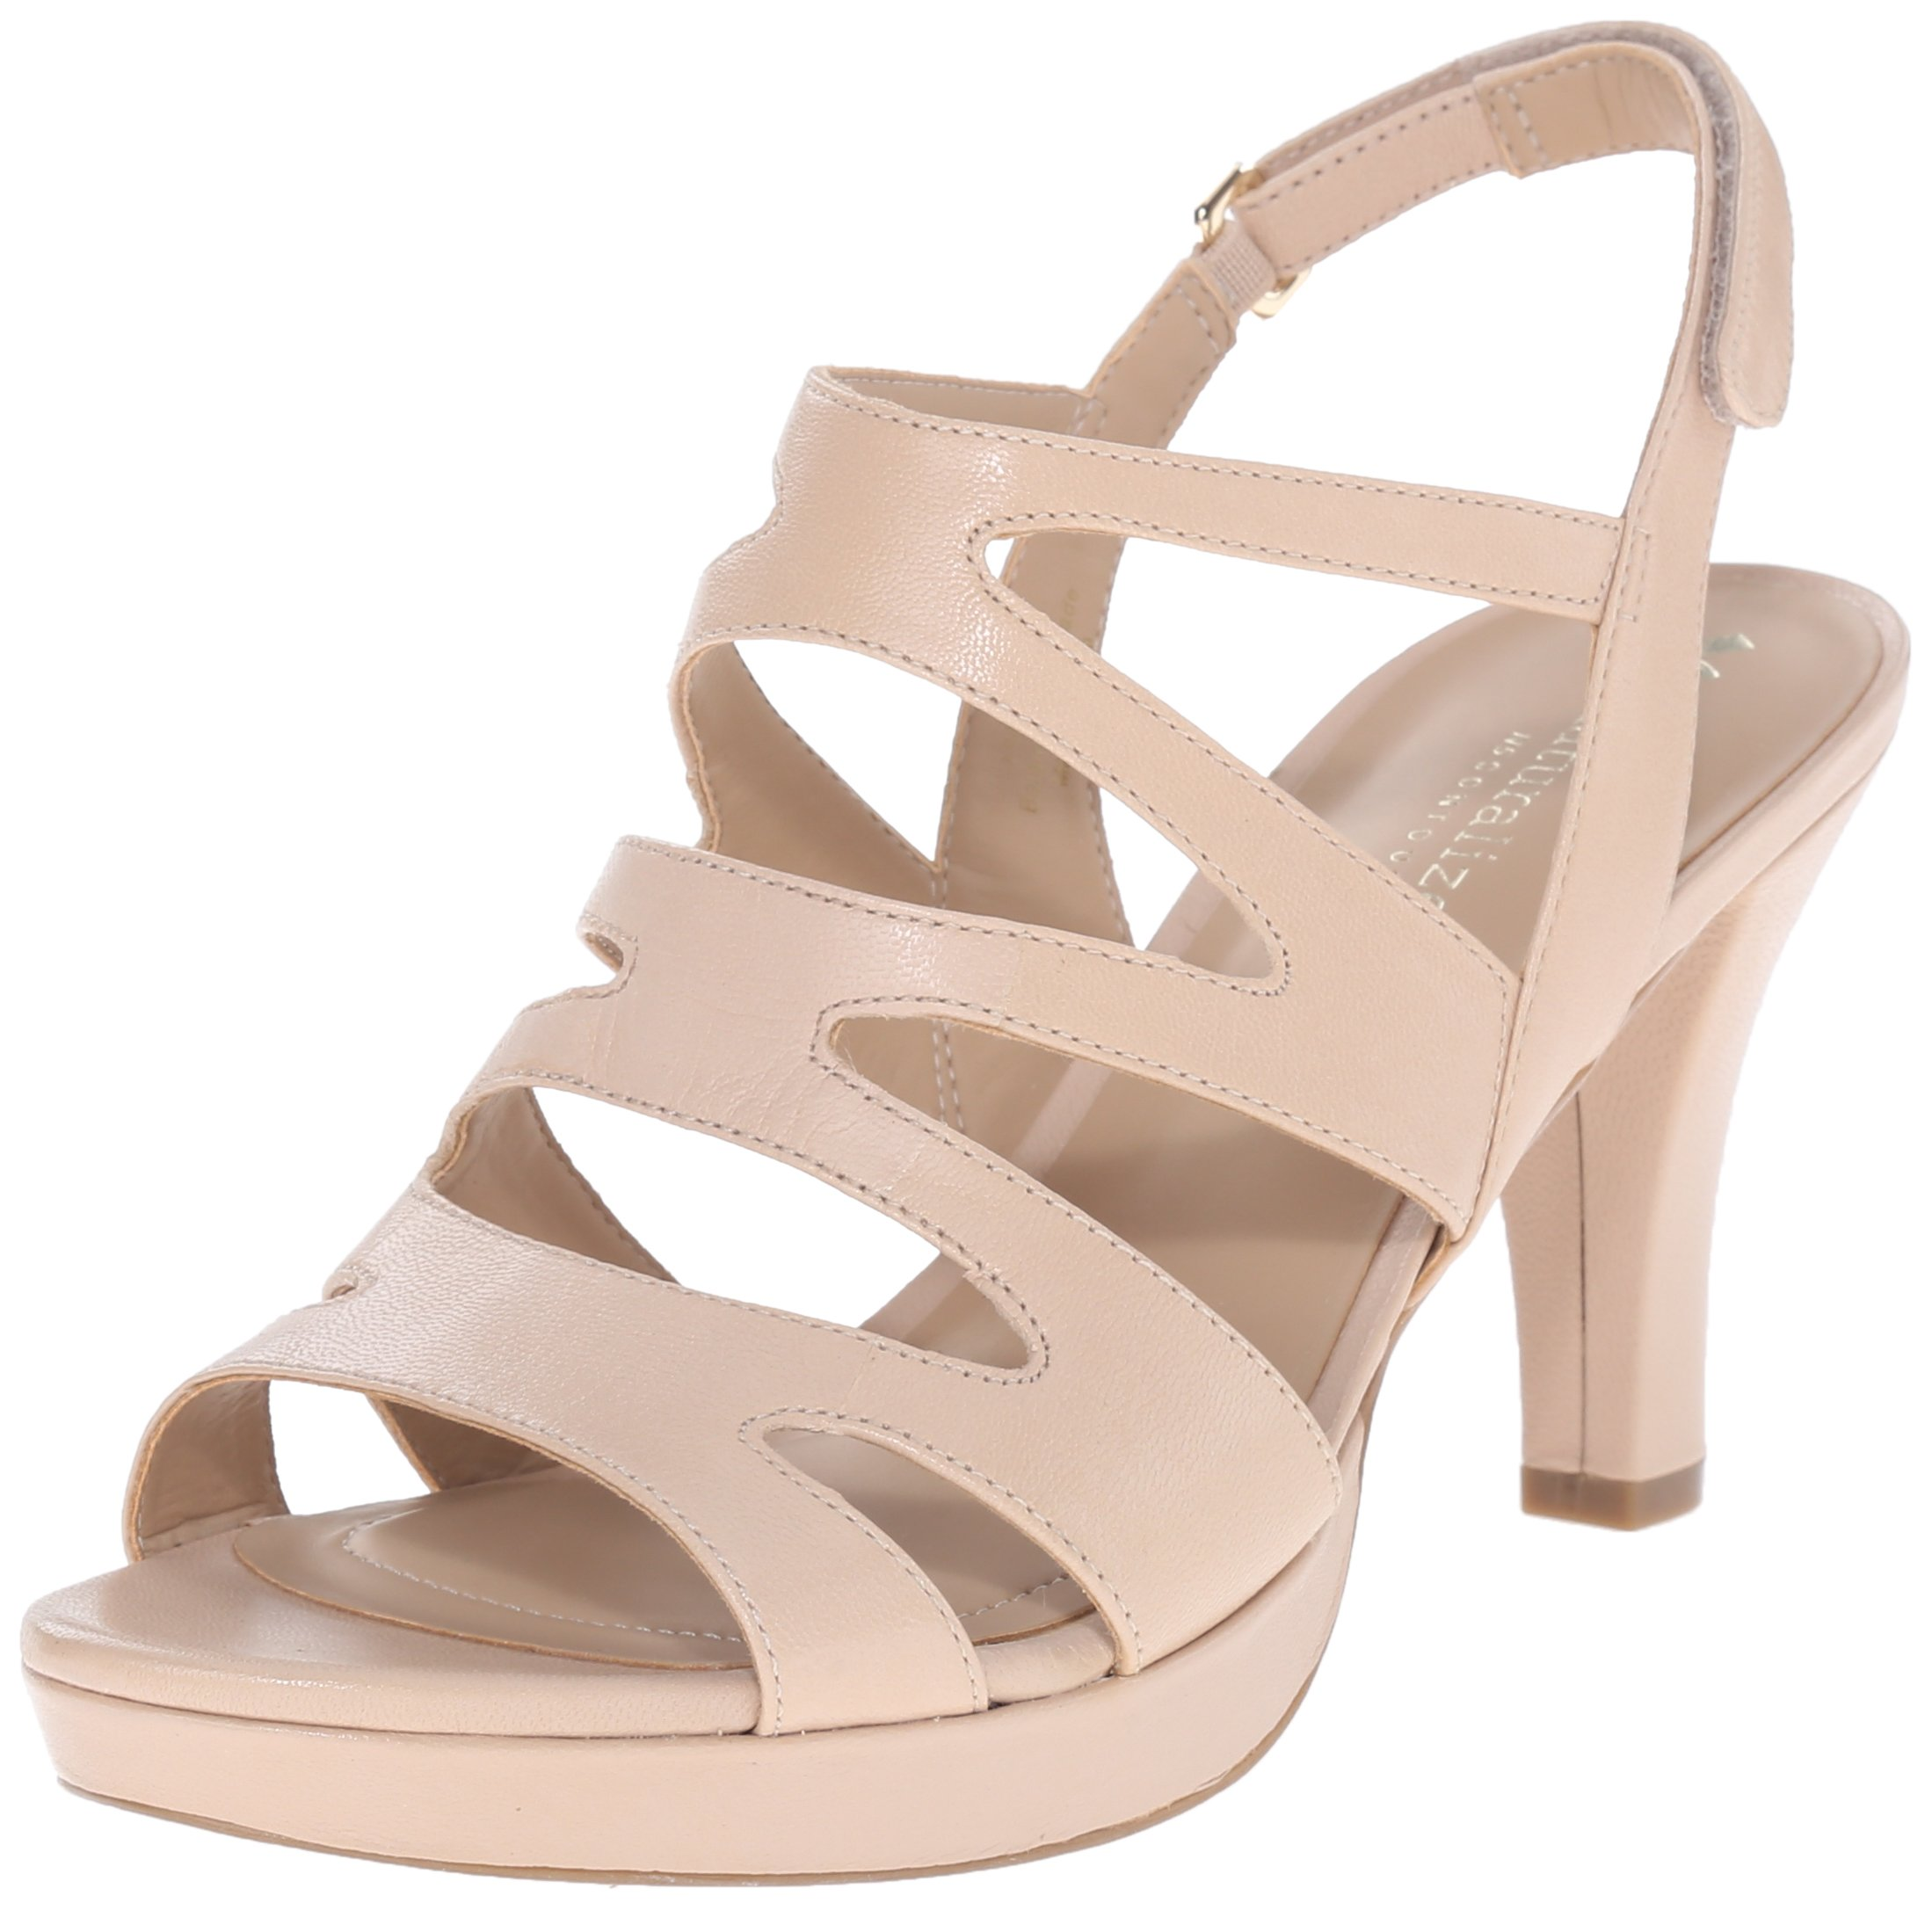 5073cb4106c4 Galleon - Naturalizer Women s Pressley Platform Dress Sandal